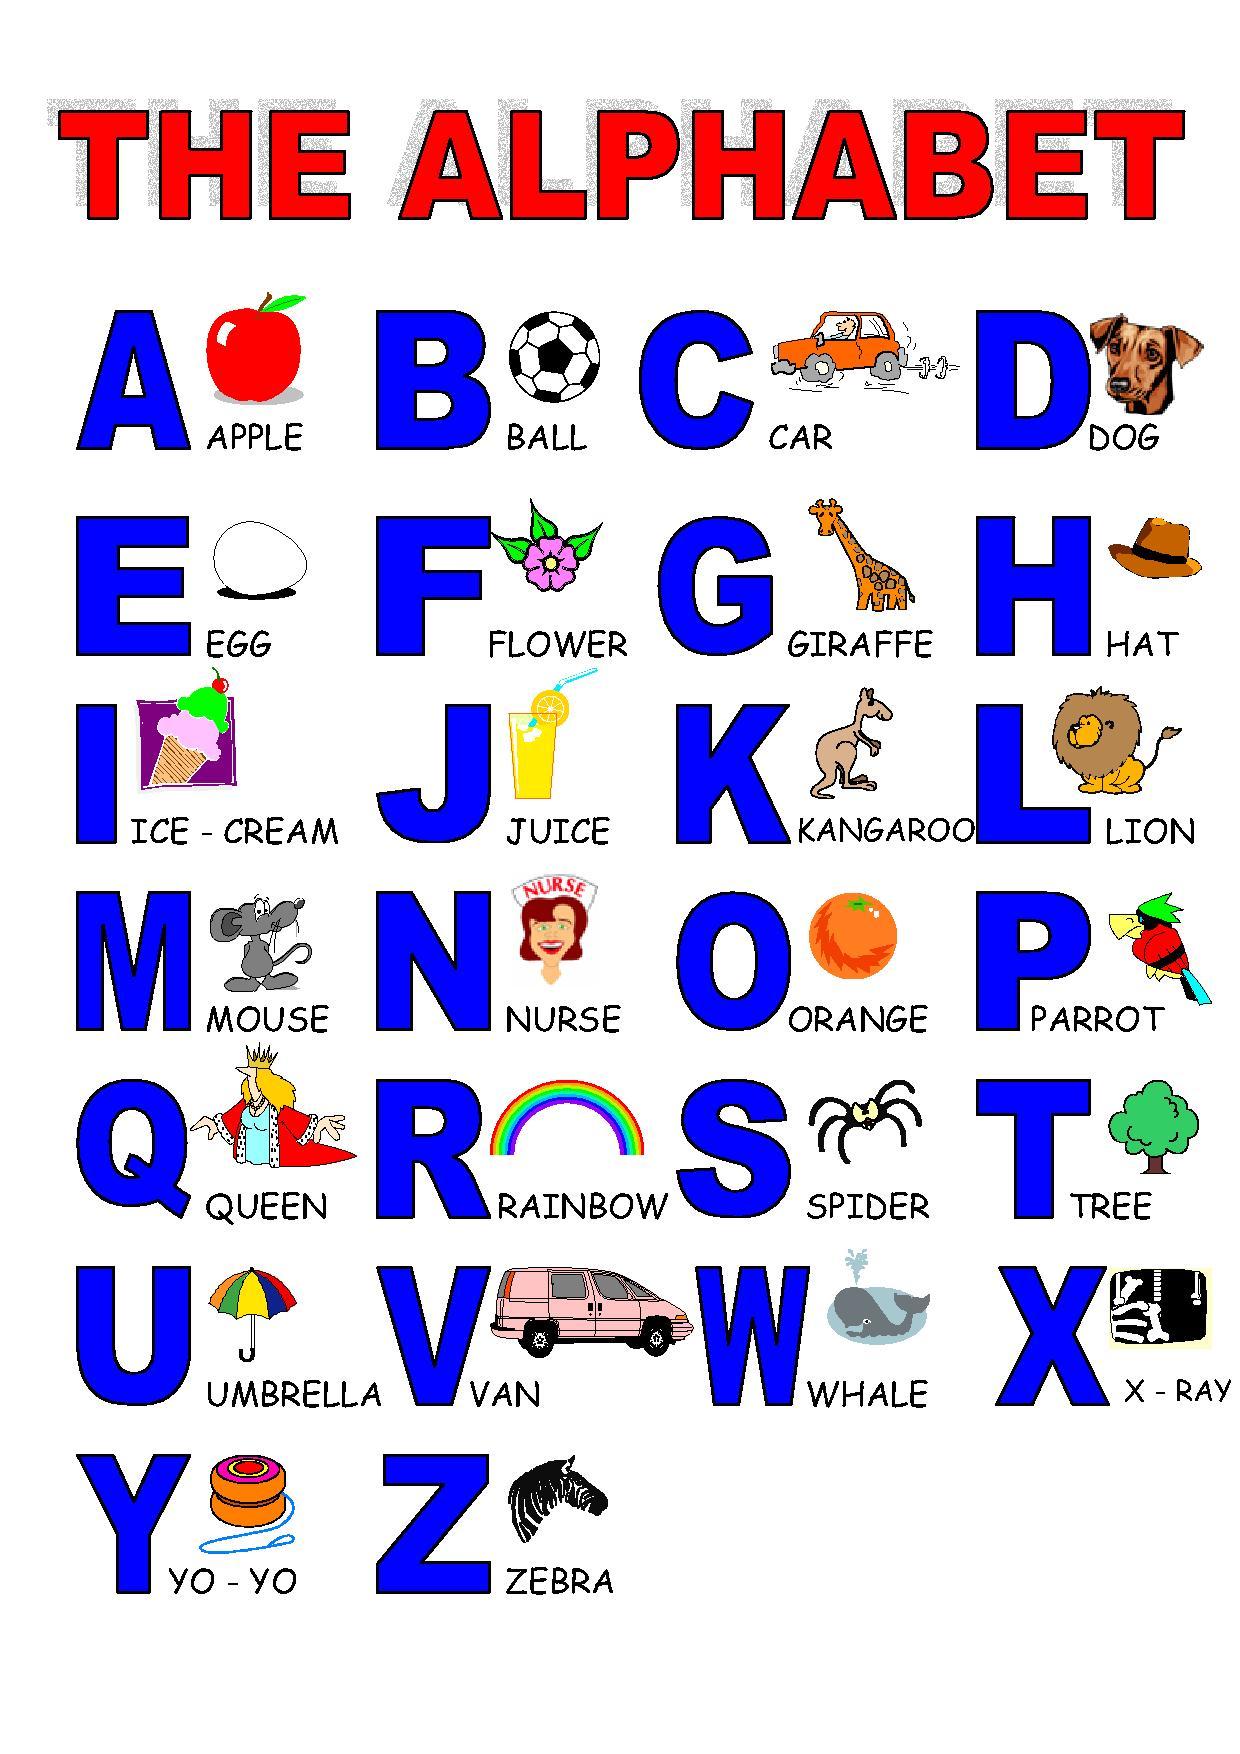 Arte Em Ensinar E Aprender Alfabeto Ingles Infantil Divirta Se Aprendendo Quem Ensina Aprende